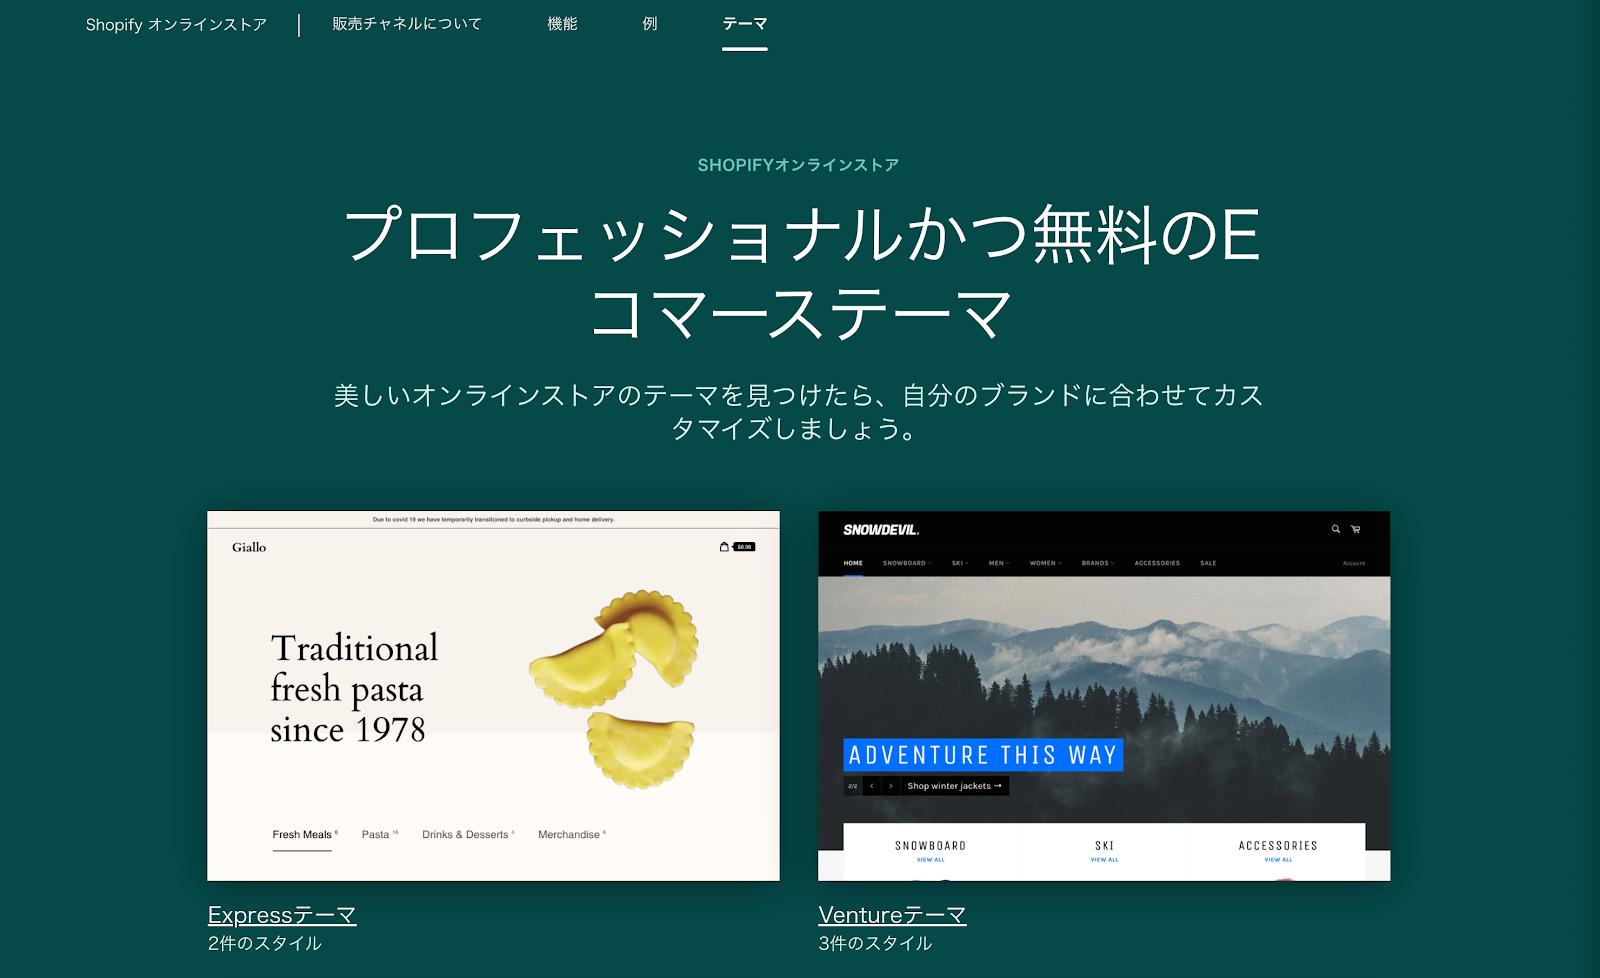 Shopify公式ページデザイン例